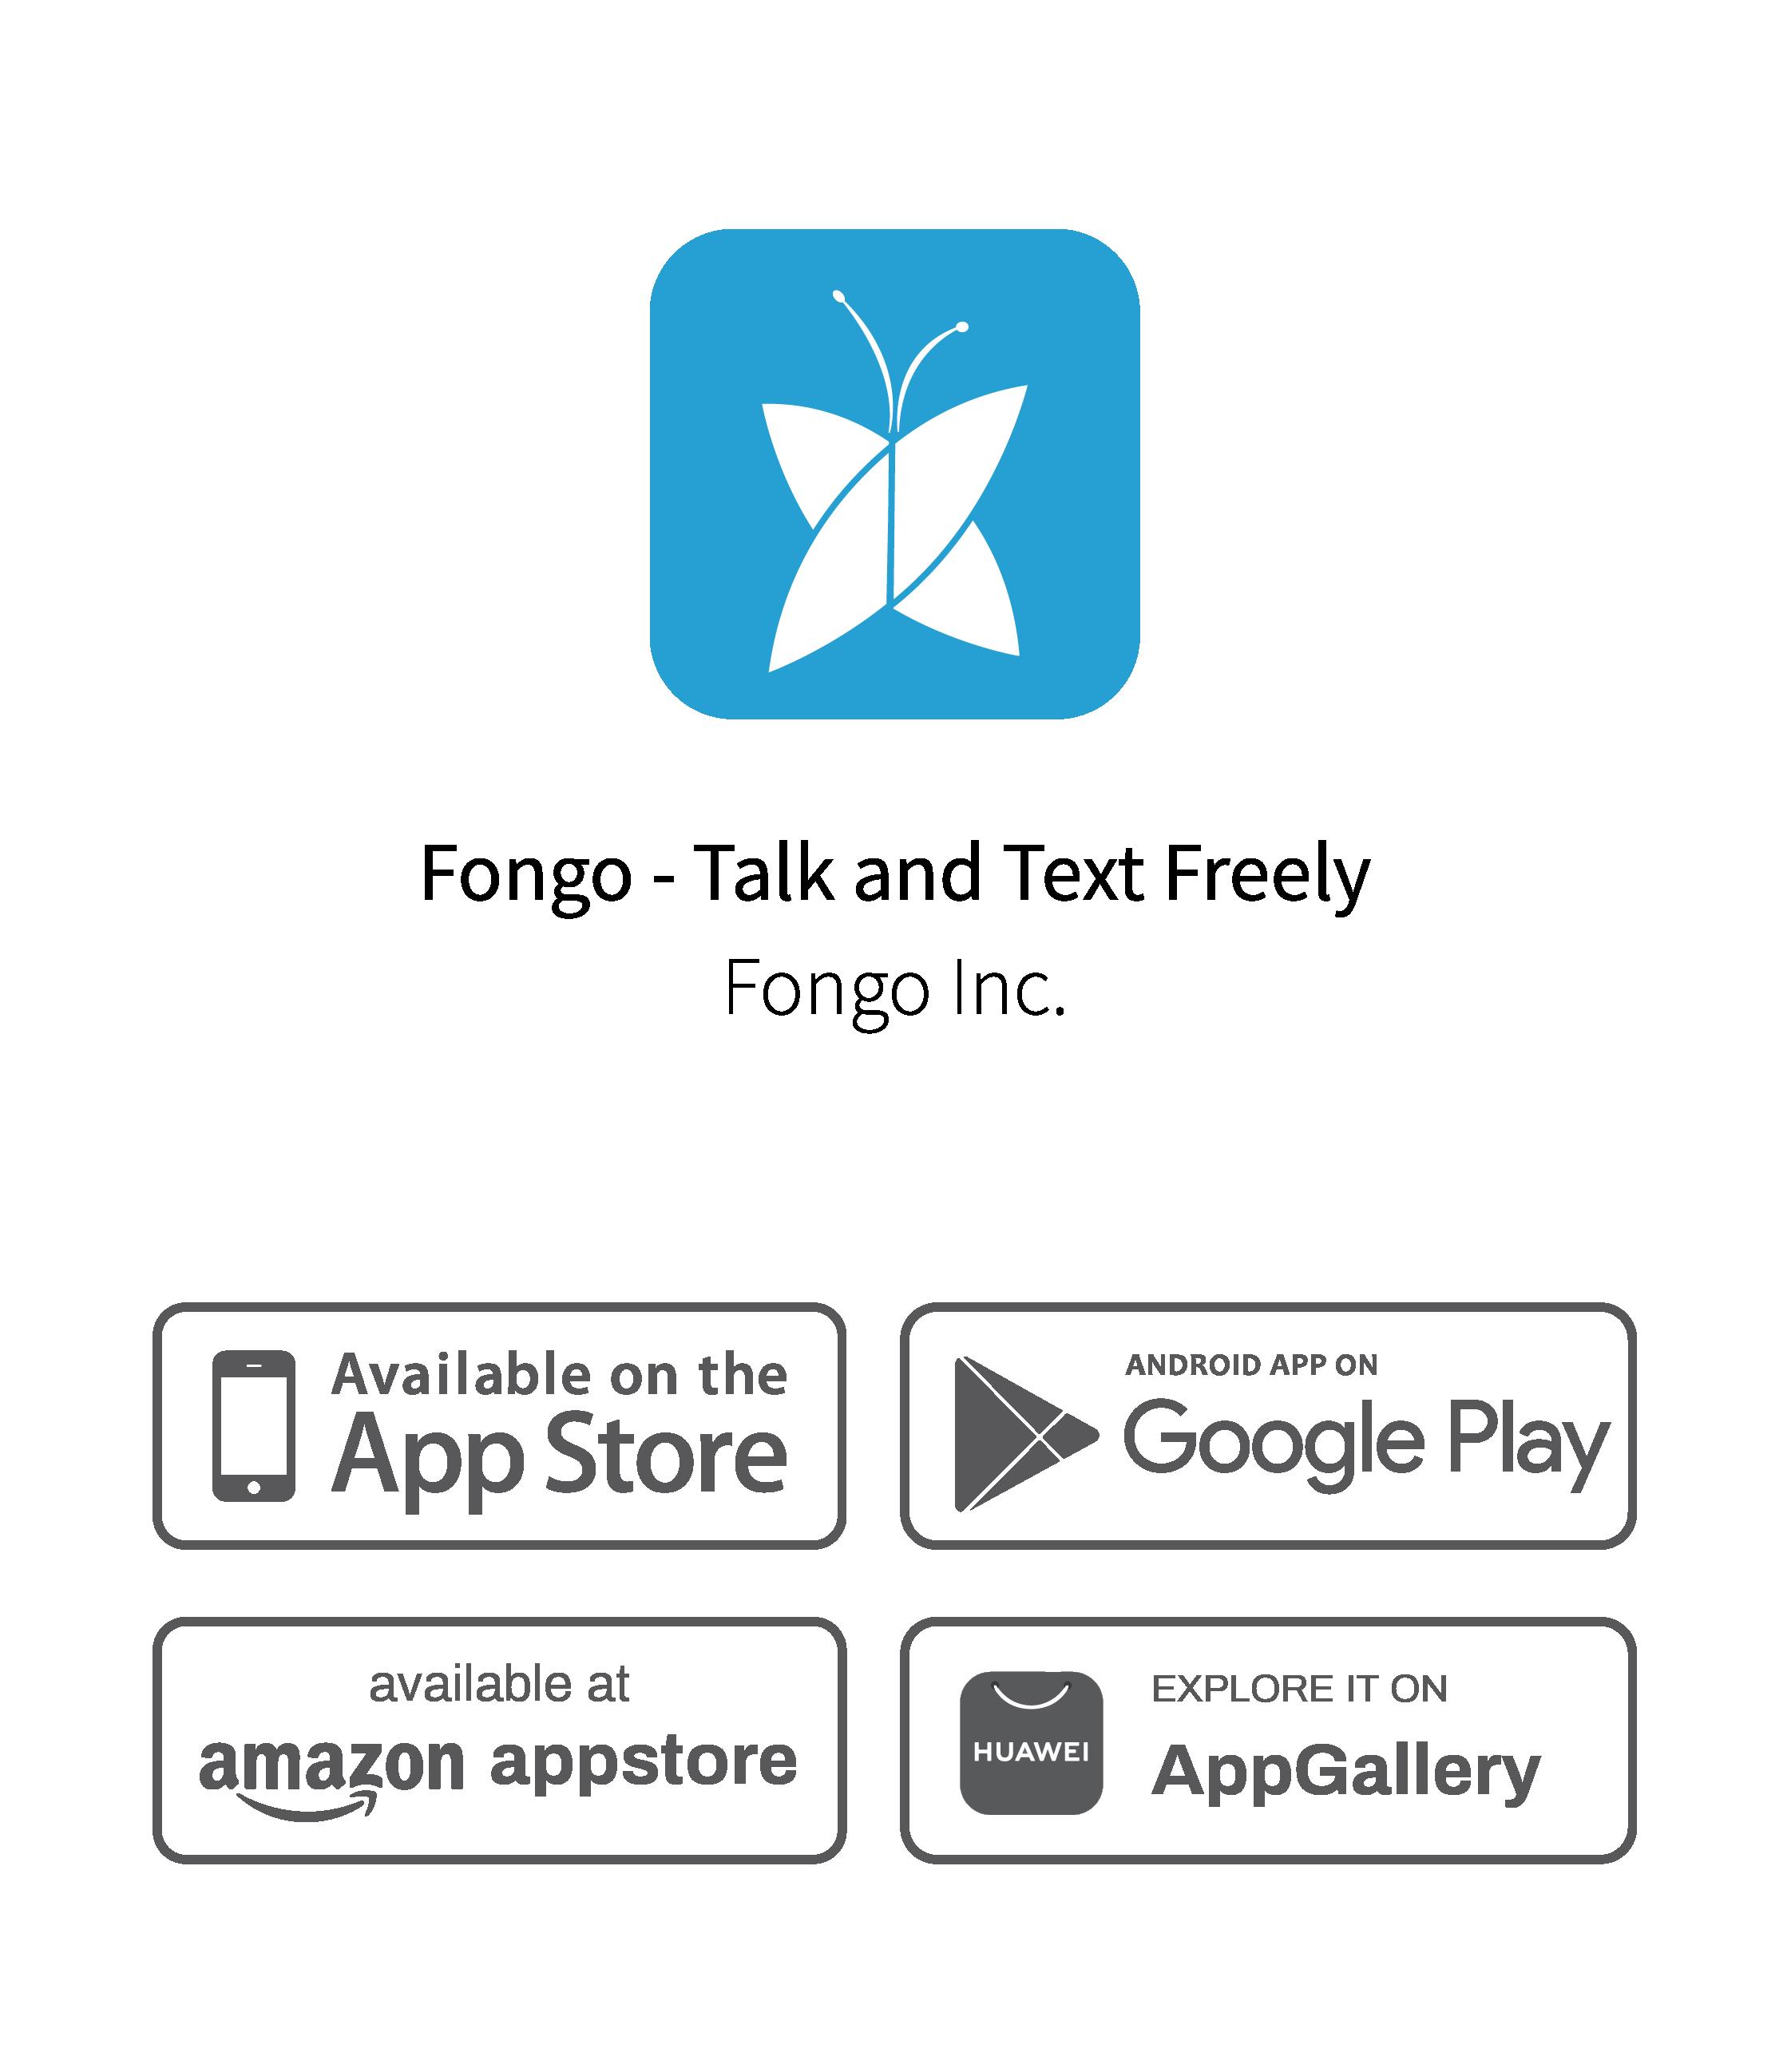 Fongo Mobile App Store